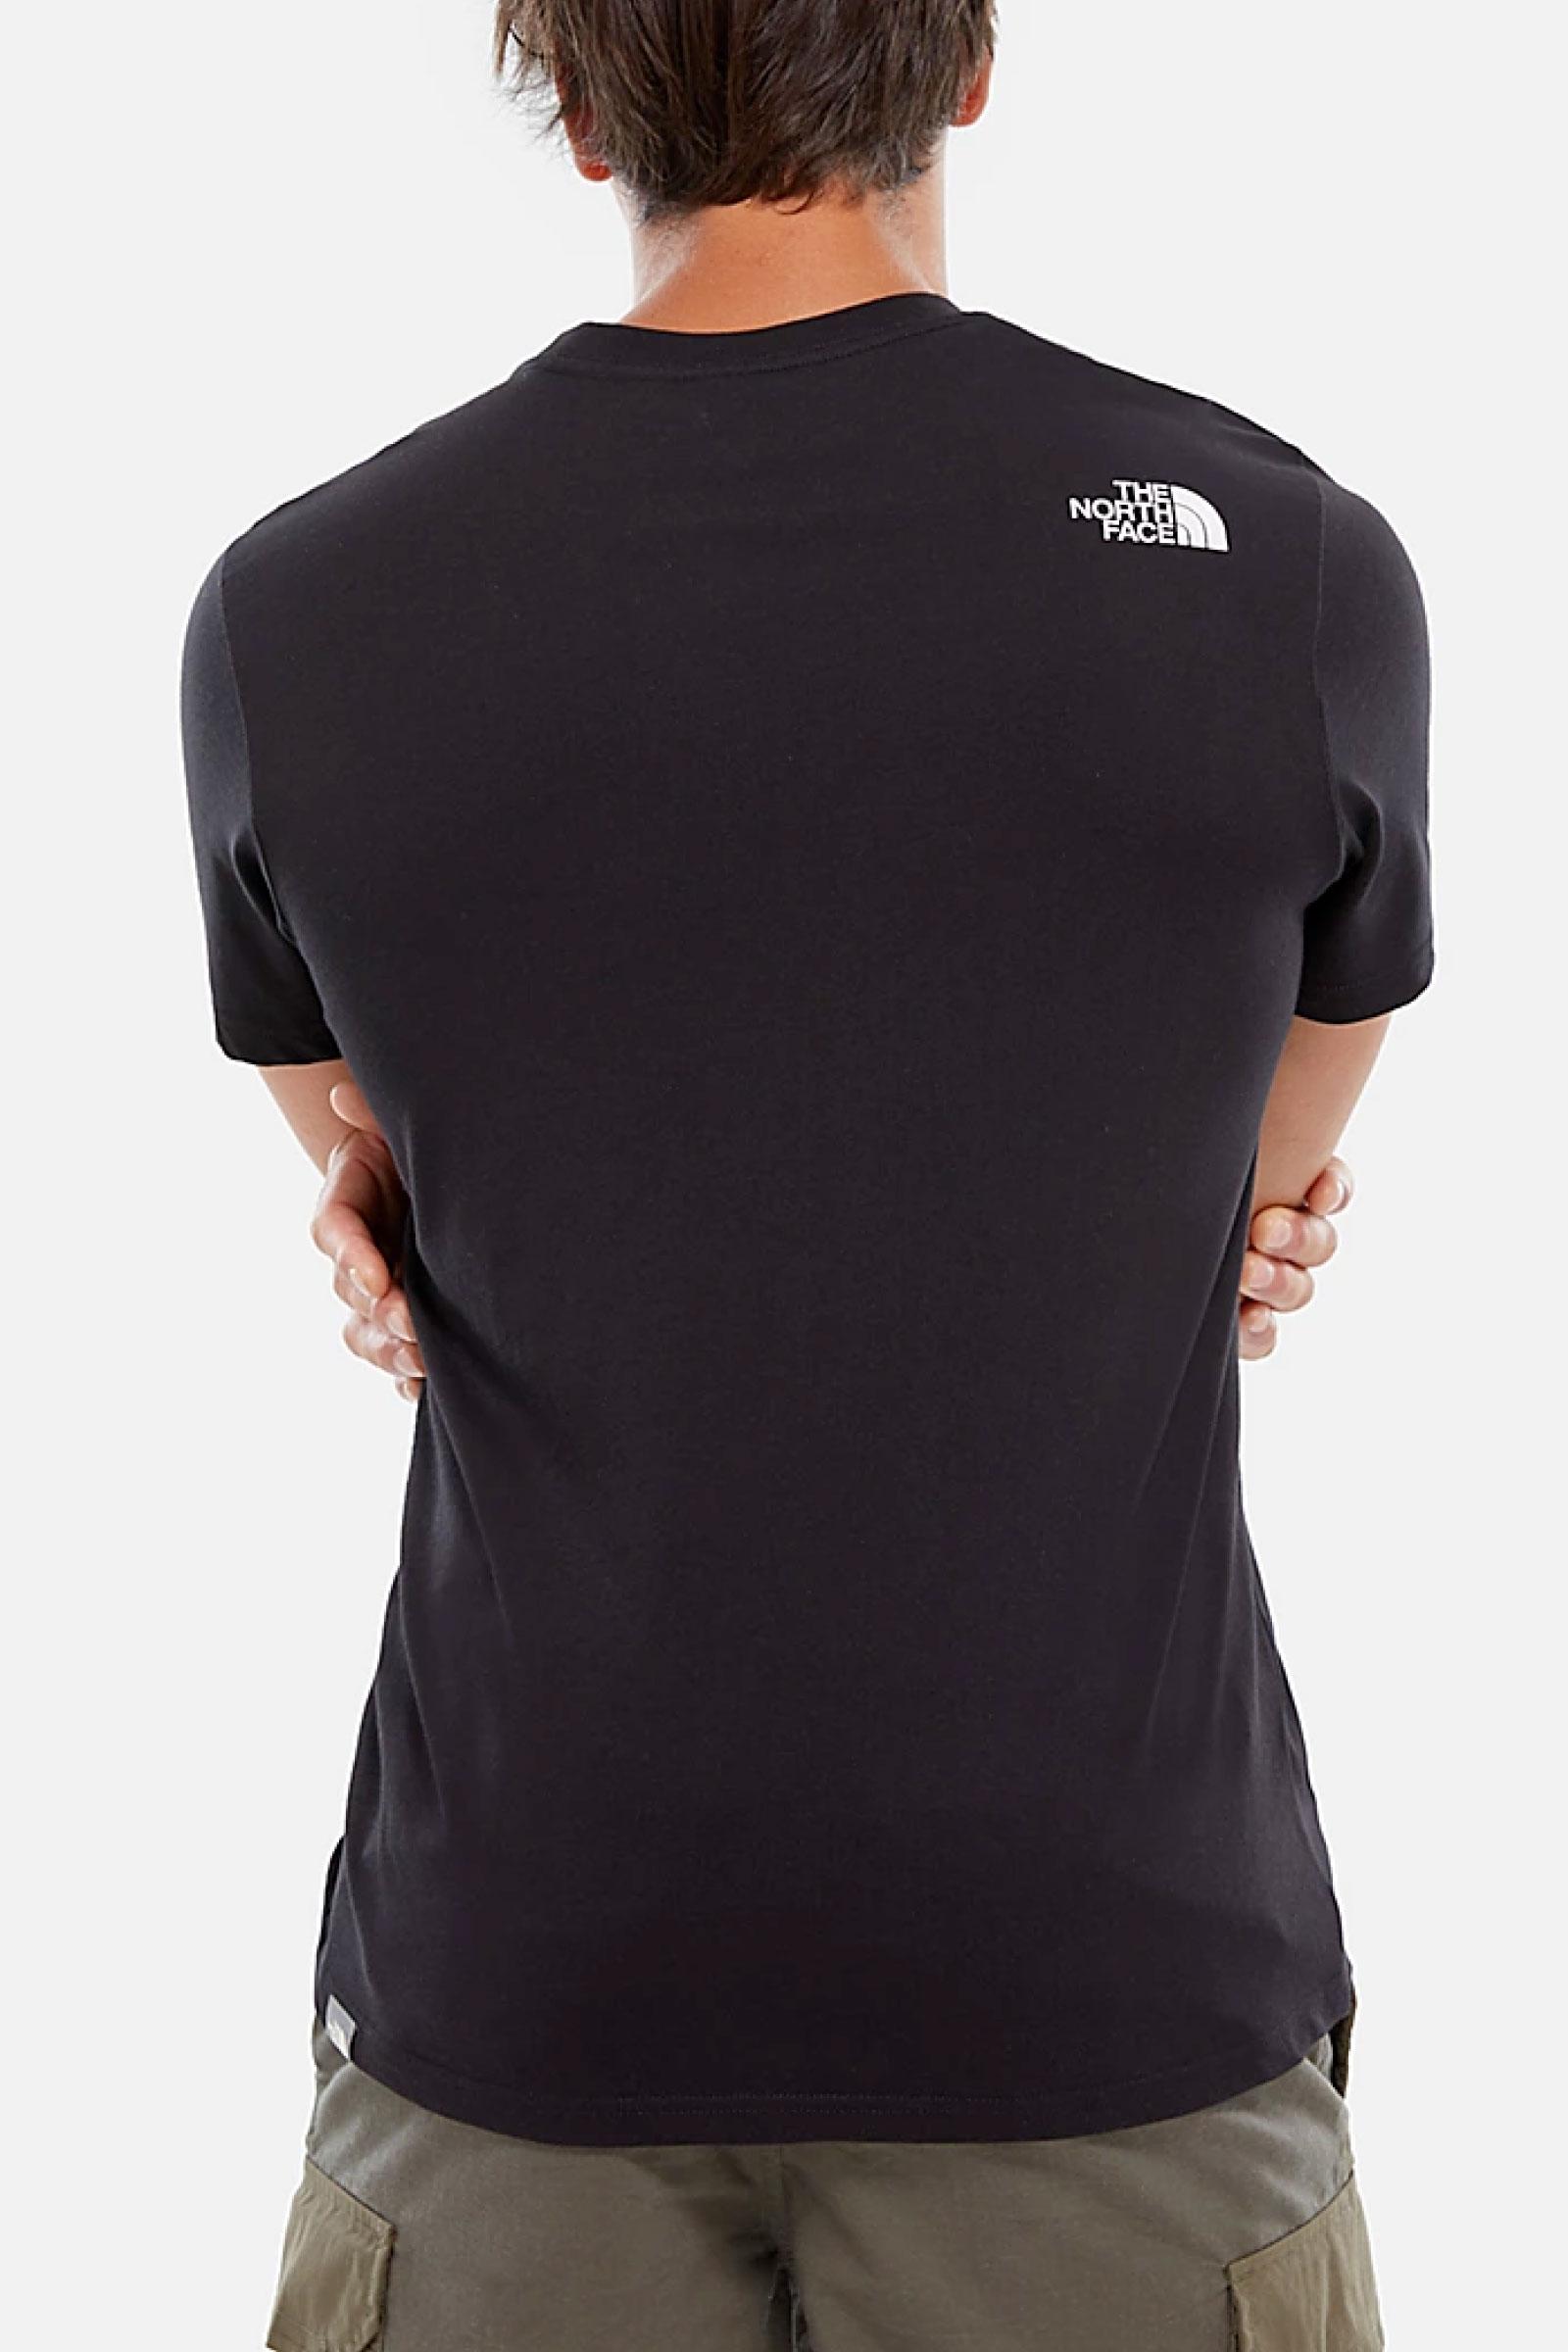 THE NORTH FACE | T-Shirt | NF00A3G2JK31